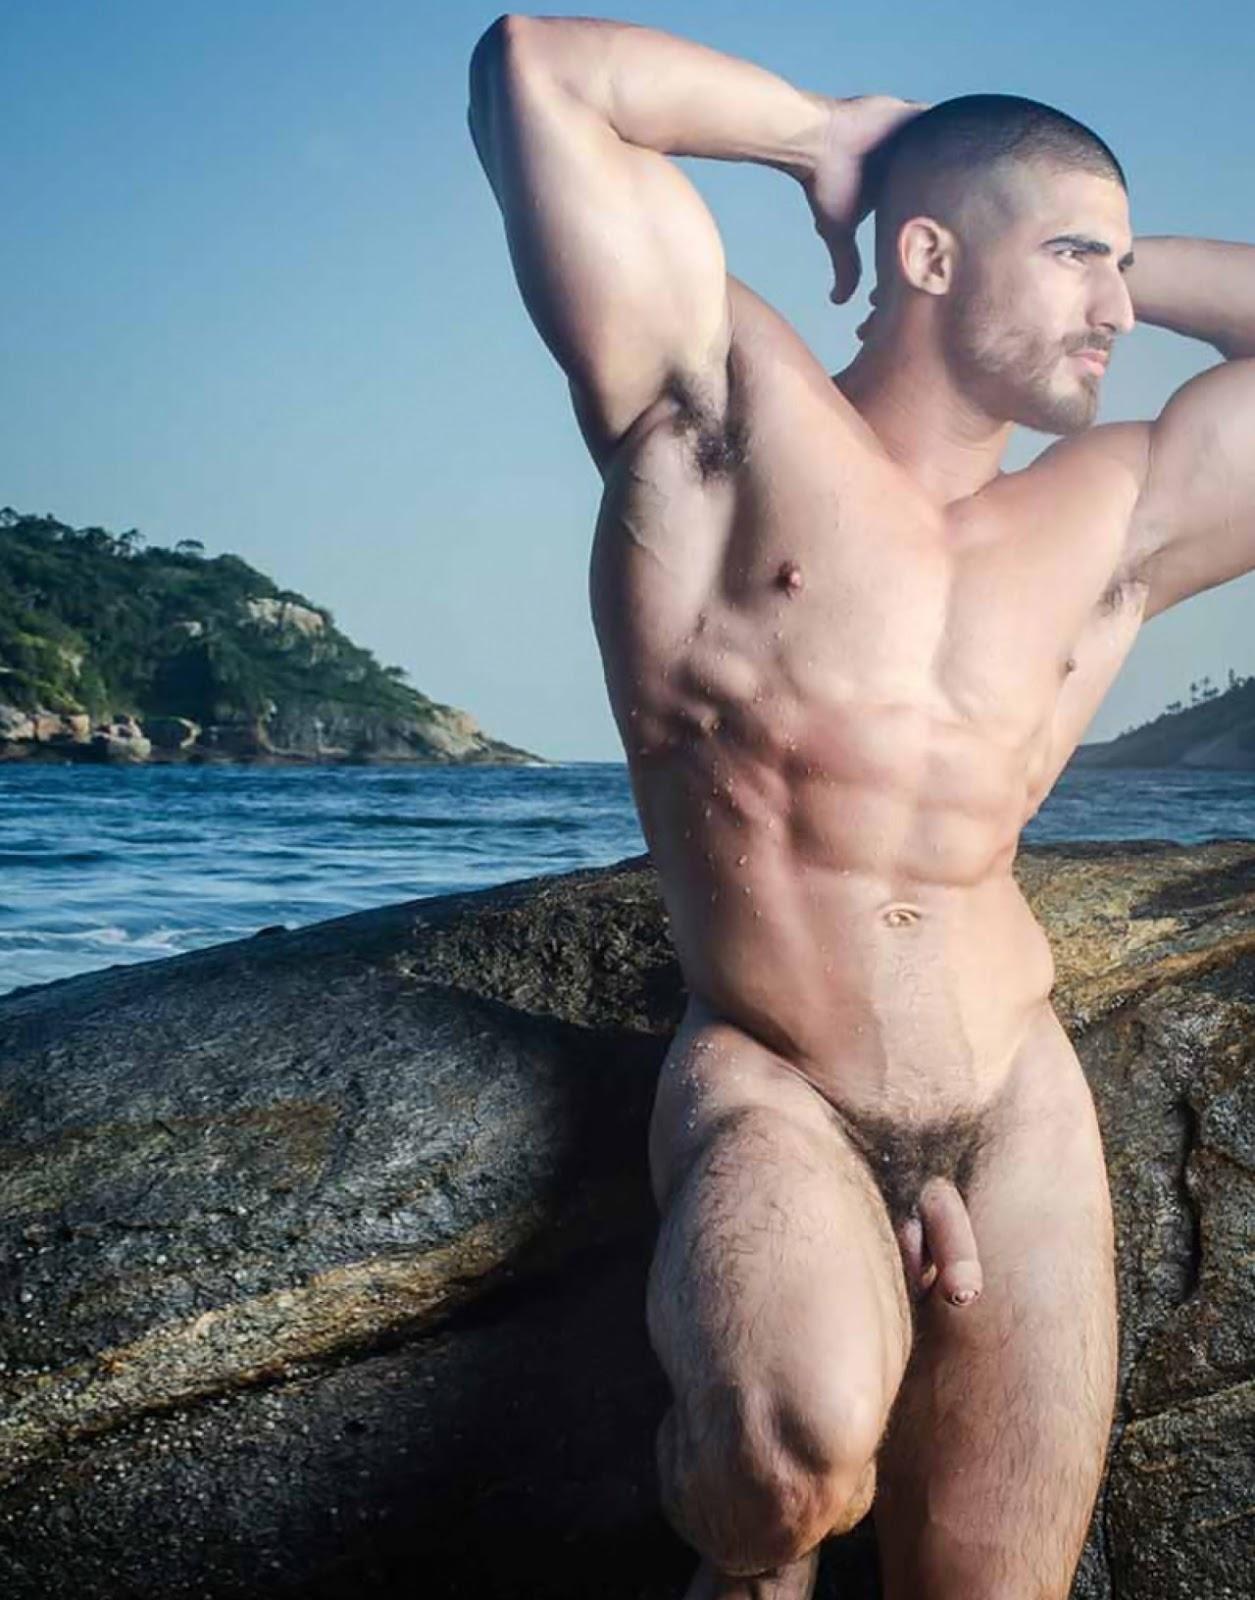 Big black naked man muscle